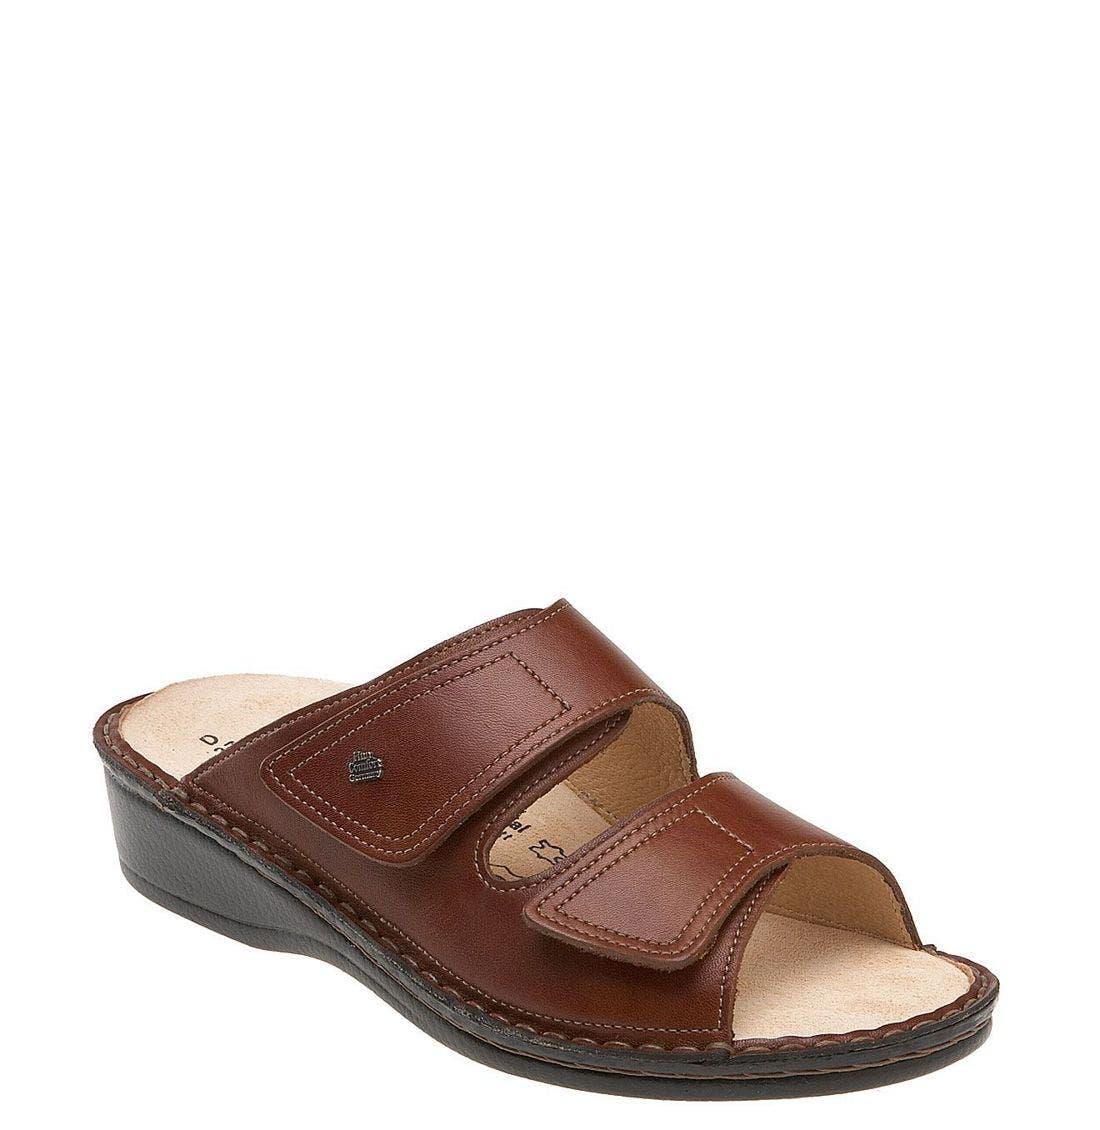 'Jamaica' Sandal,                             Main thumbnail 1, color,                             BRANDY